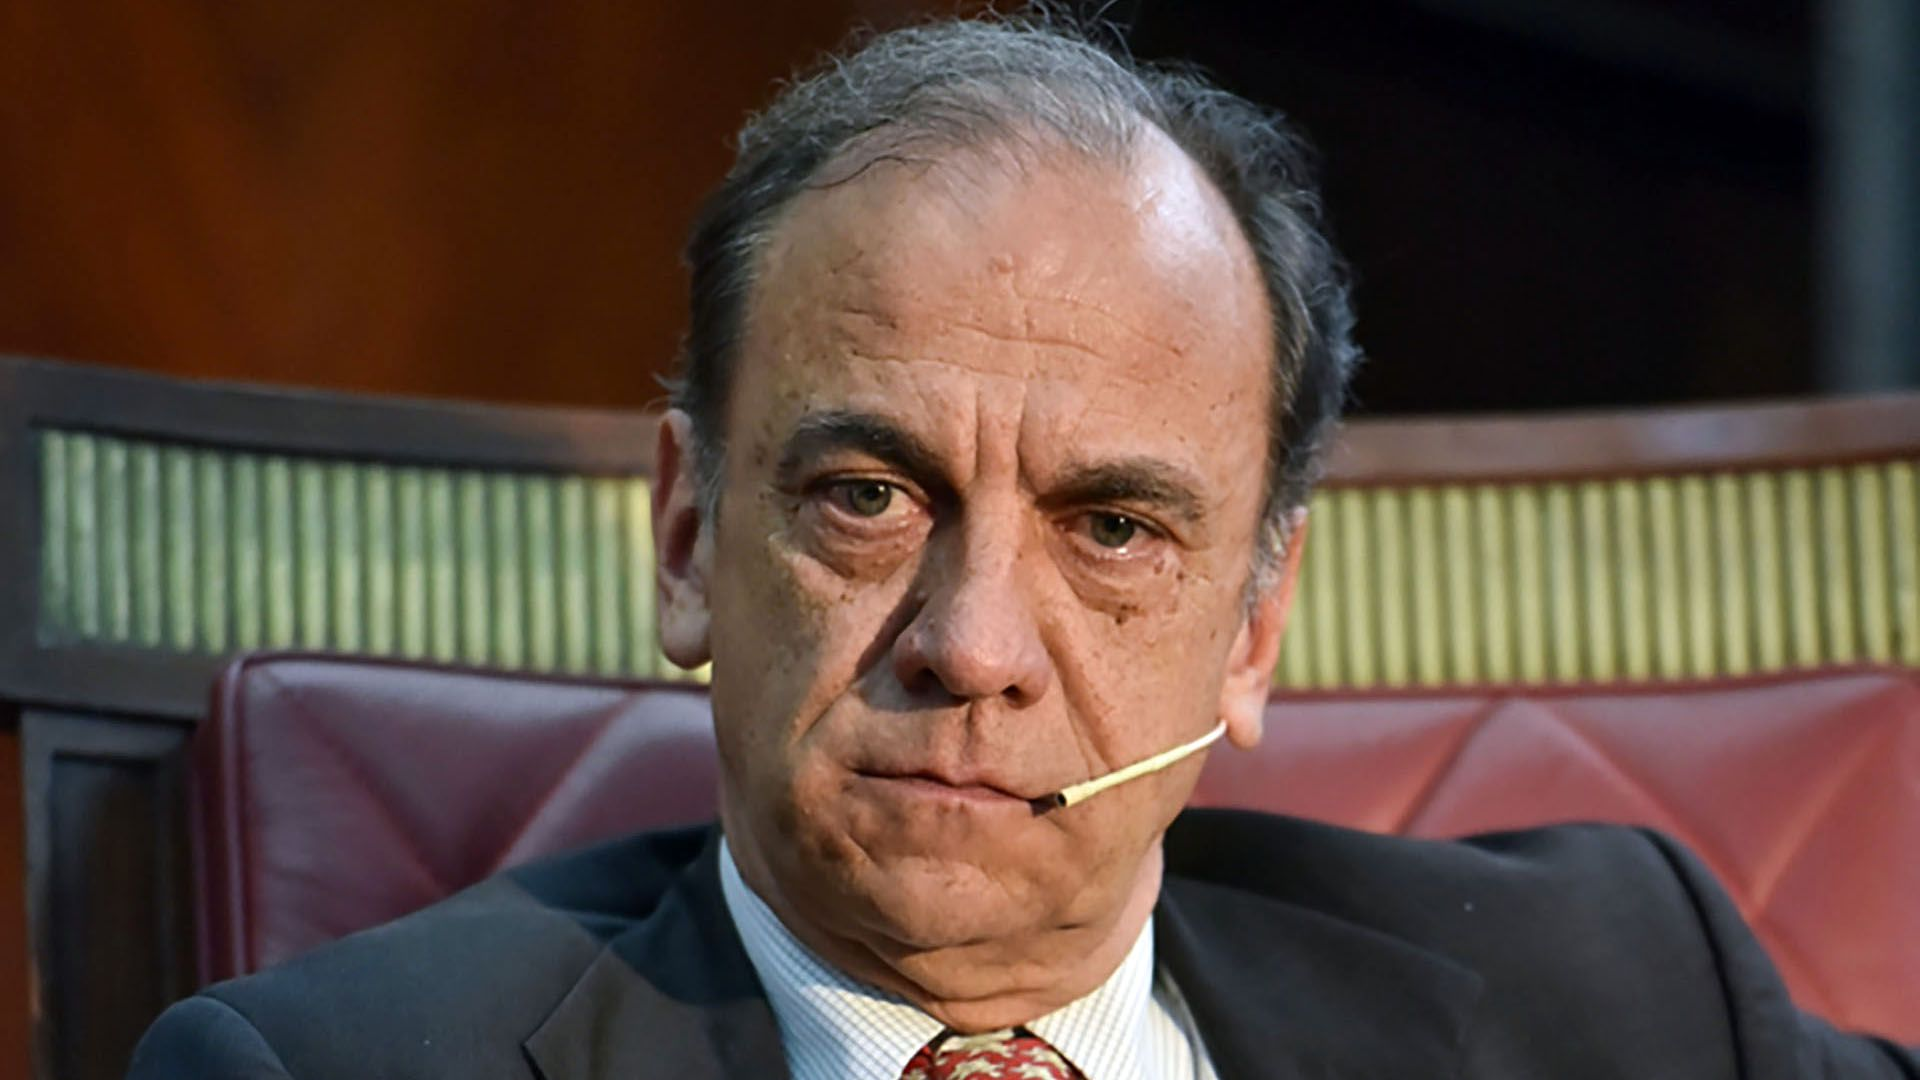 Raúl Pleé (Guille Llamos)